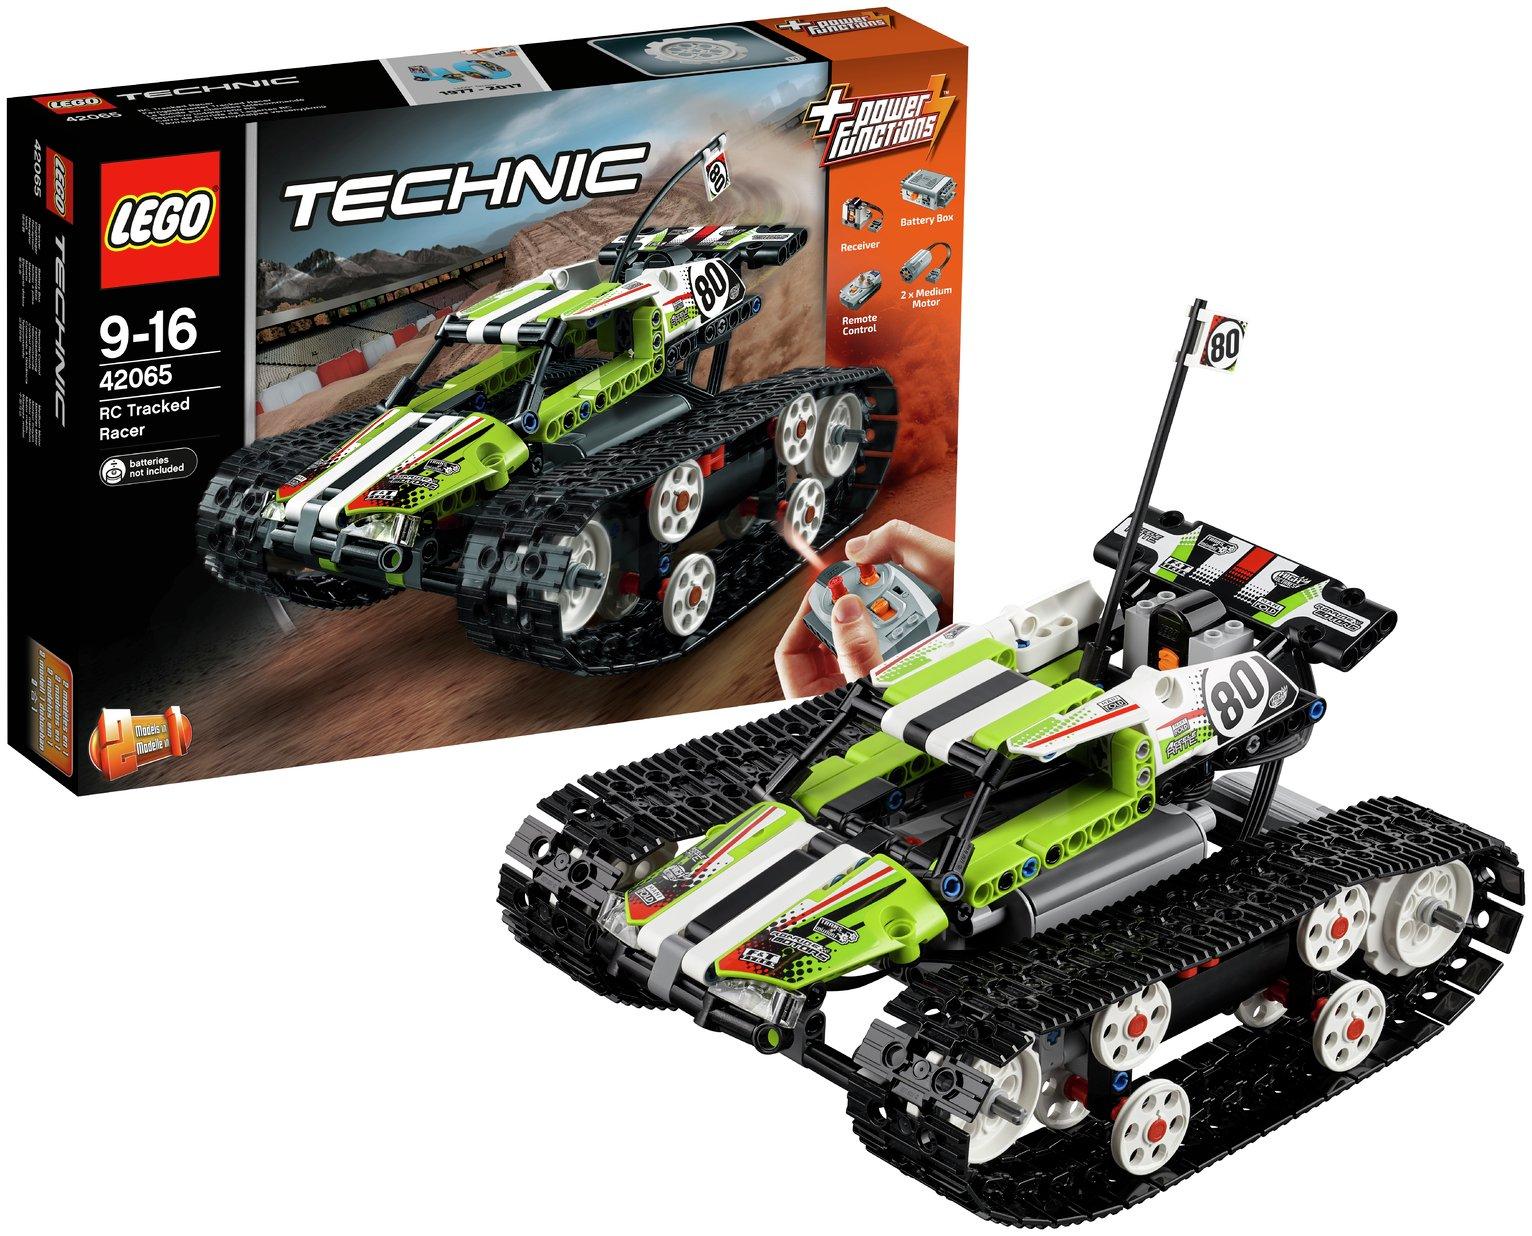 LEGO Technic RC Racer - 42065